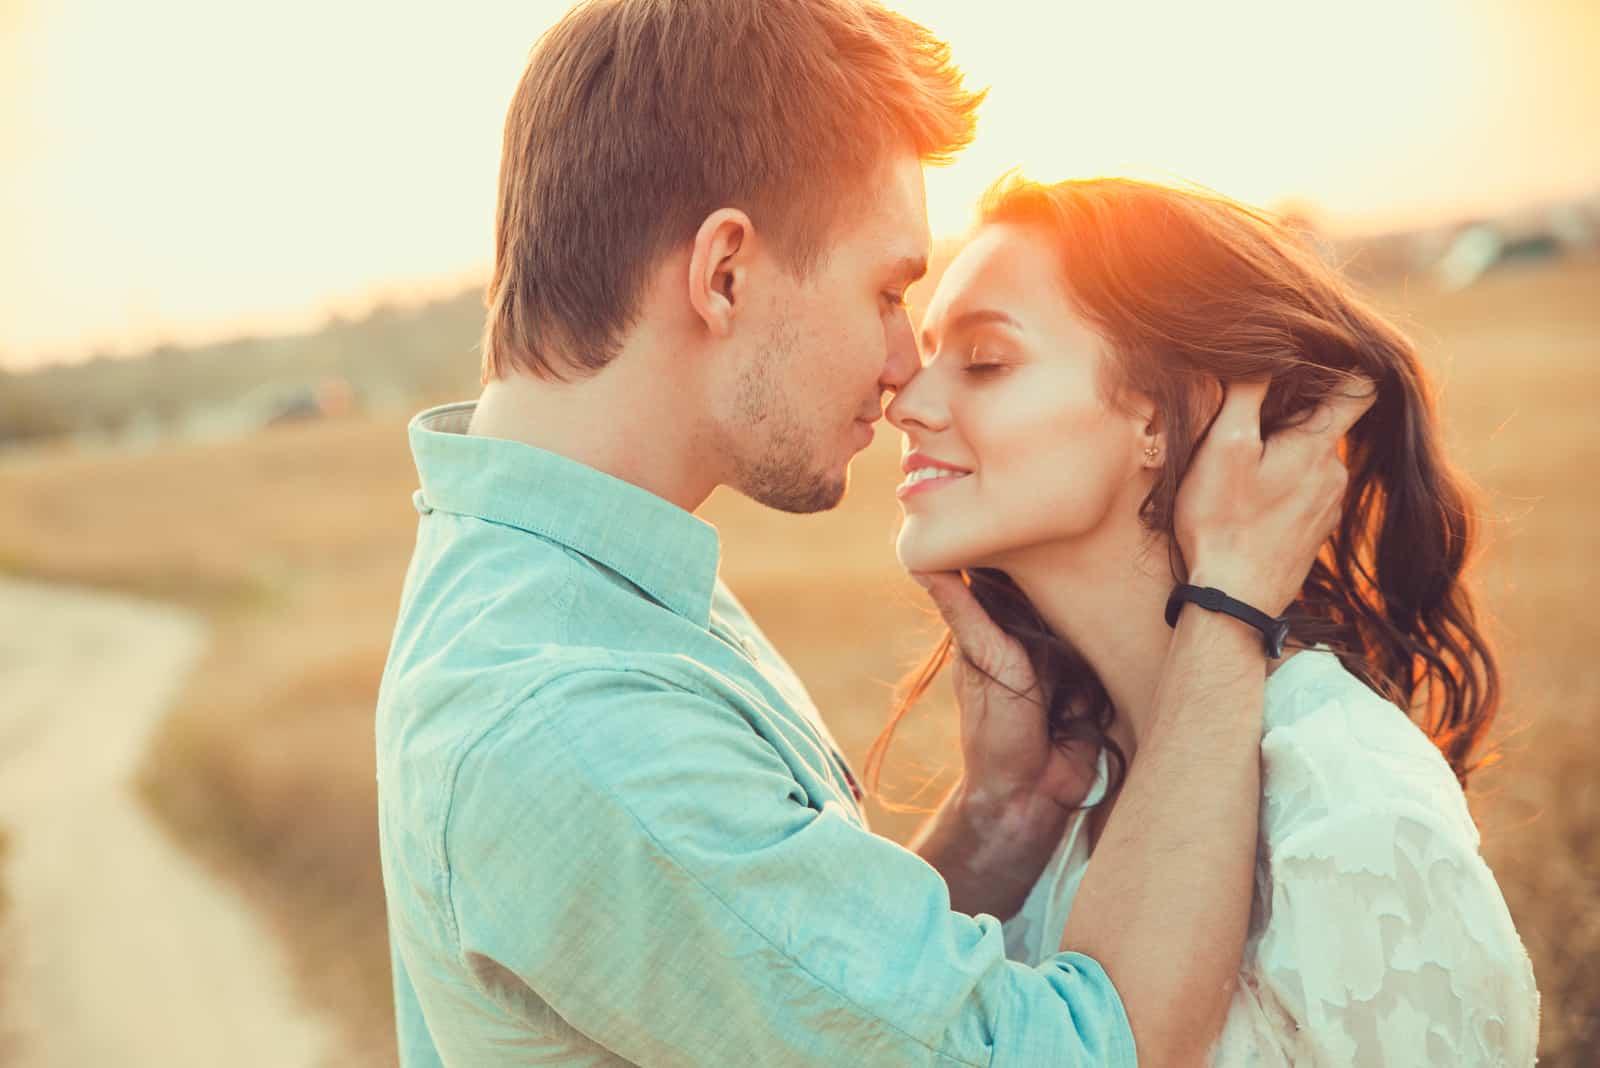 a man wants to kiss a woman